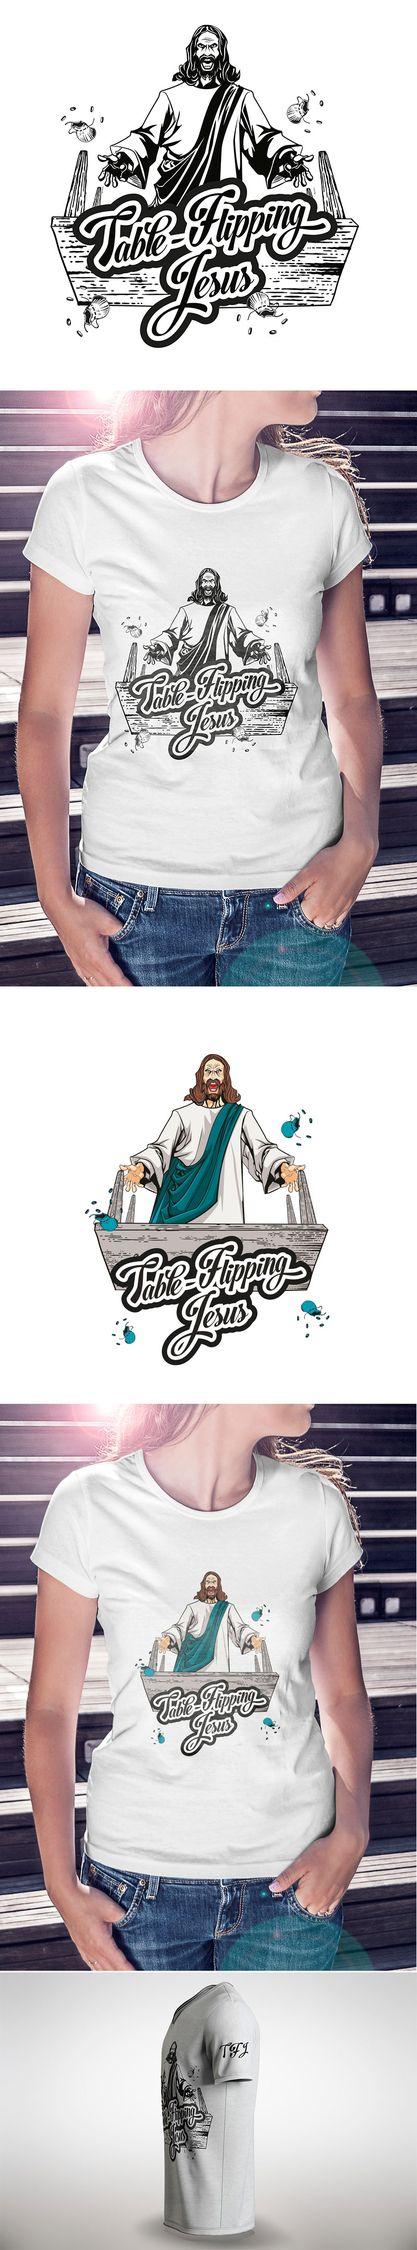 Table flipping Jesus - design w - think73   ello